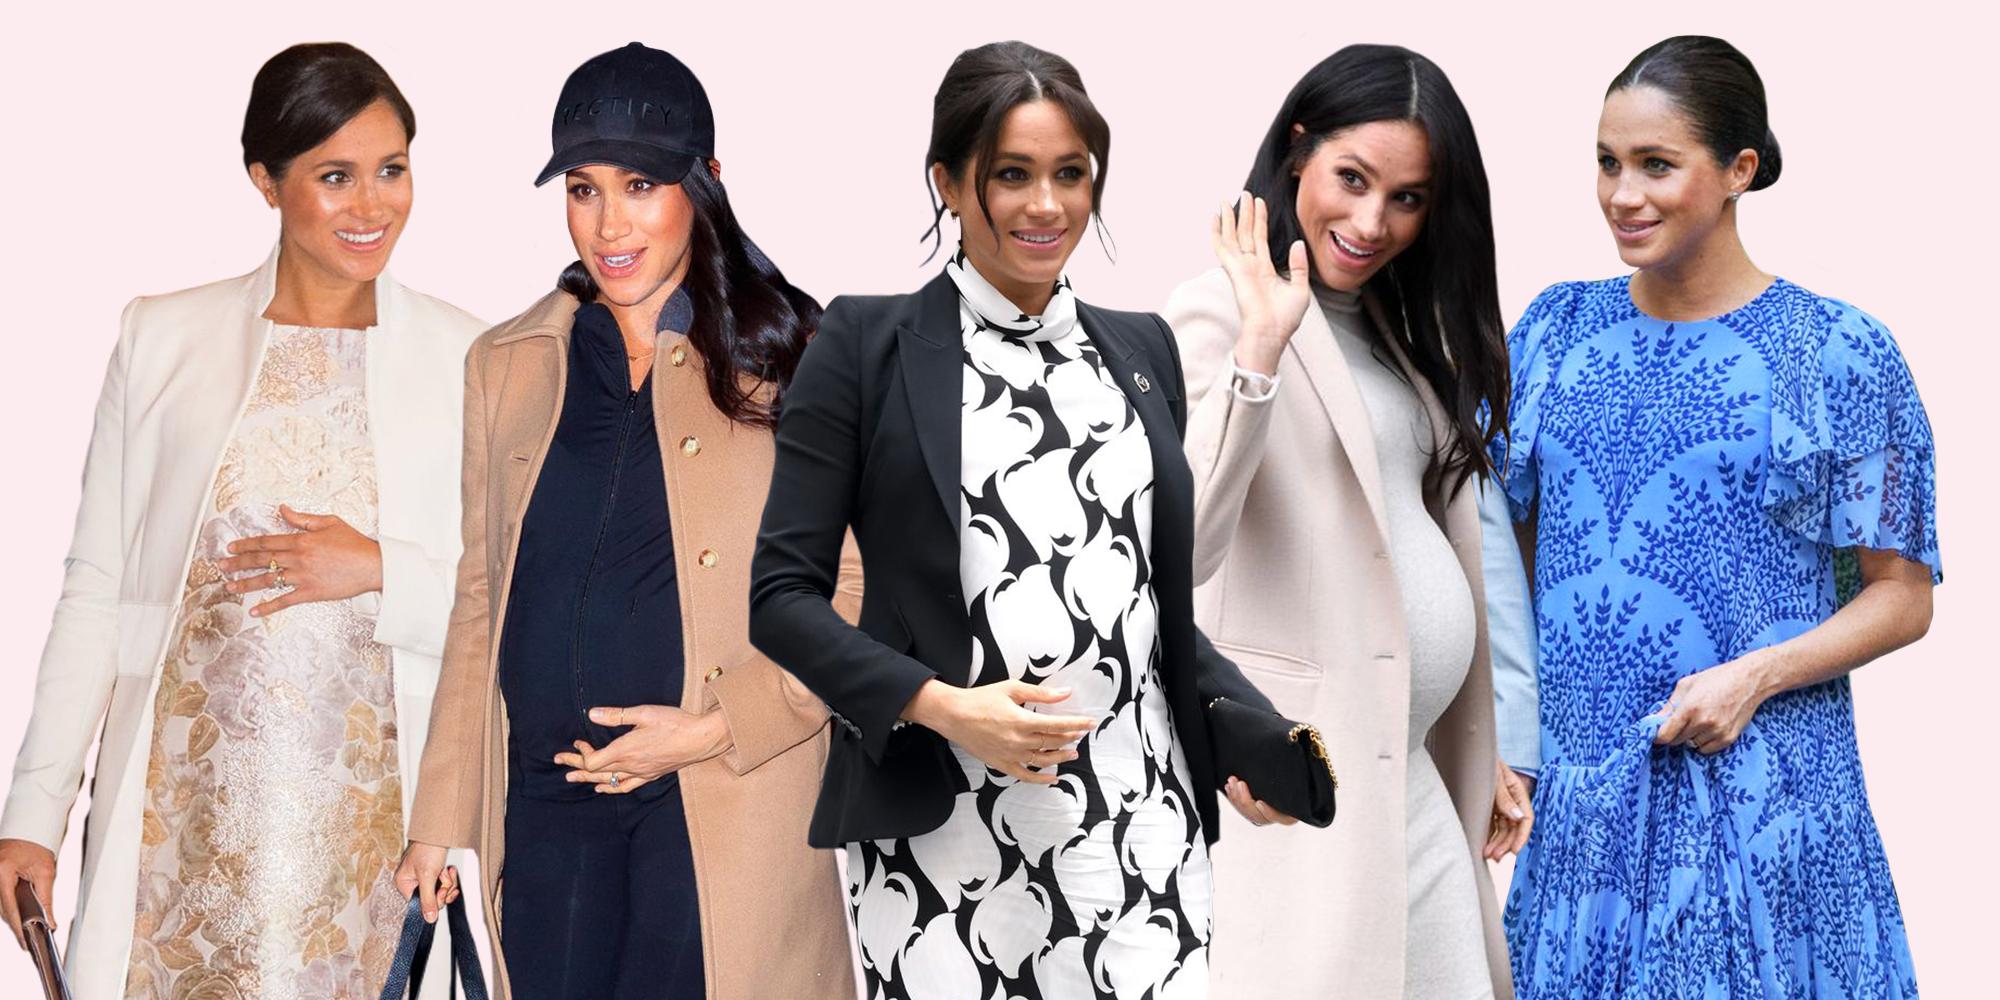 89ae0e8c9 Meghan Markle Maternity Style - Every Meghan Markle Pregnancy Outfit